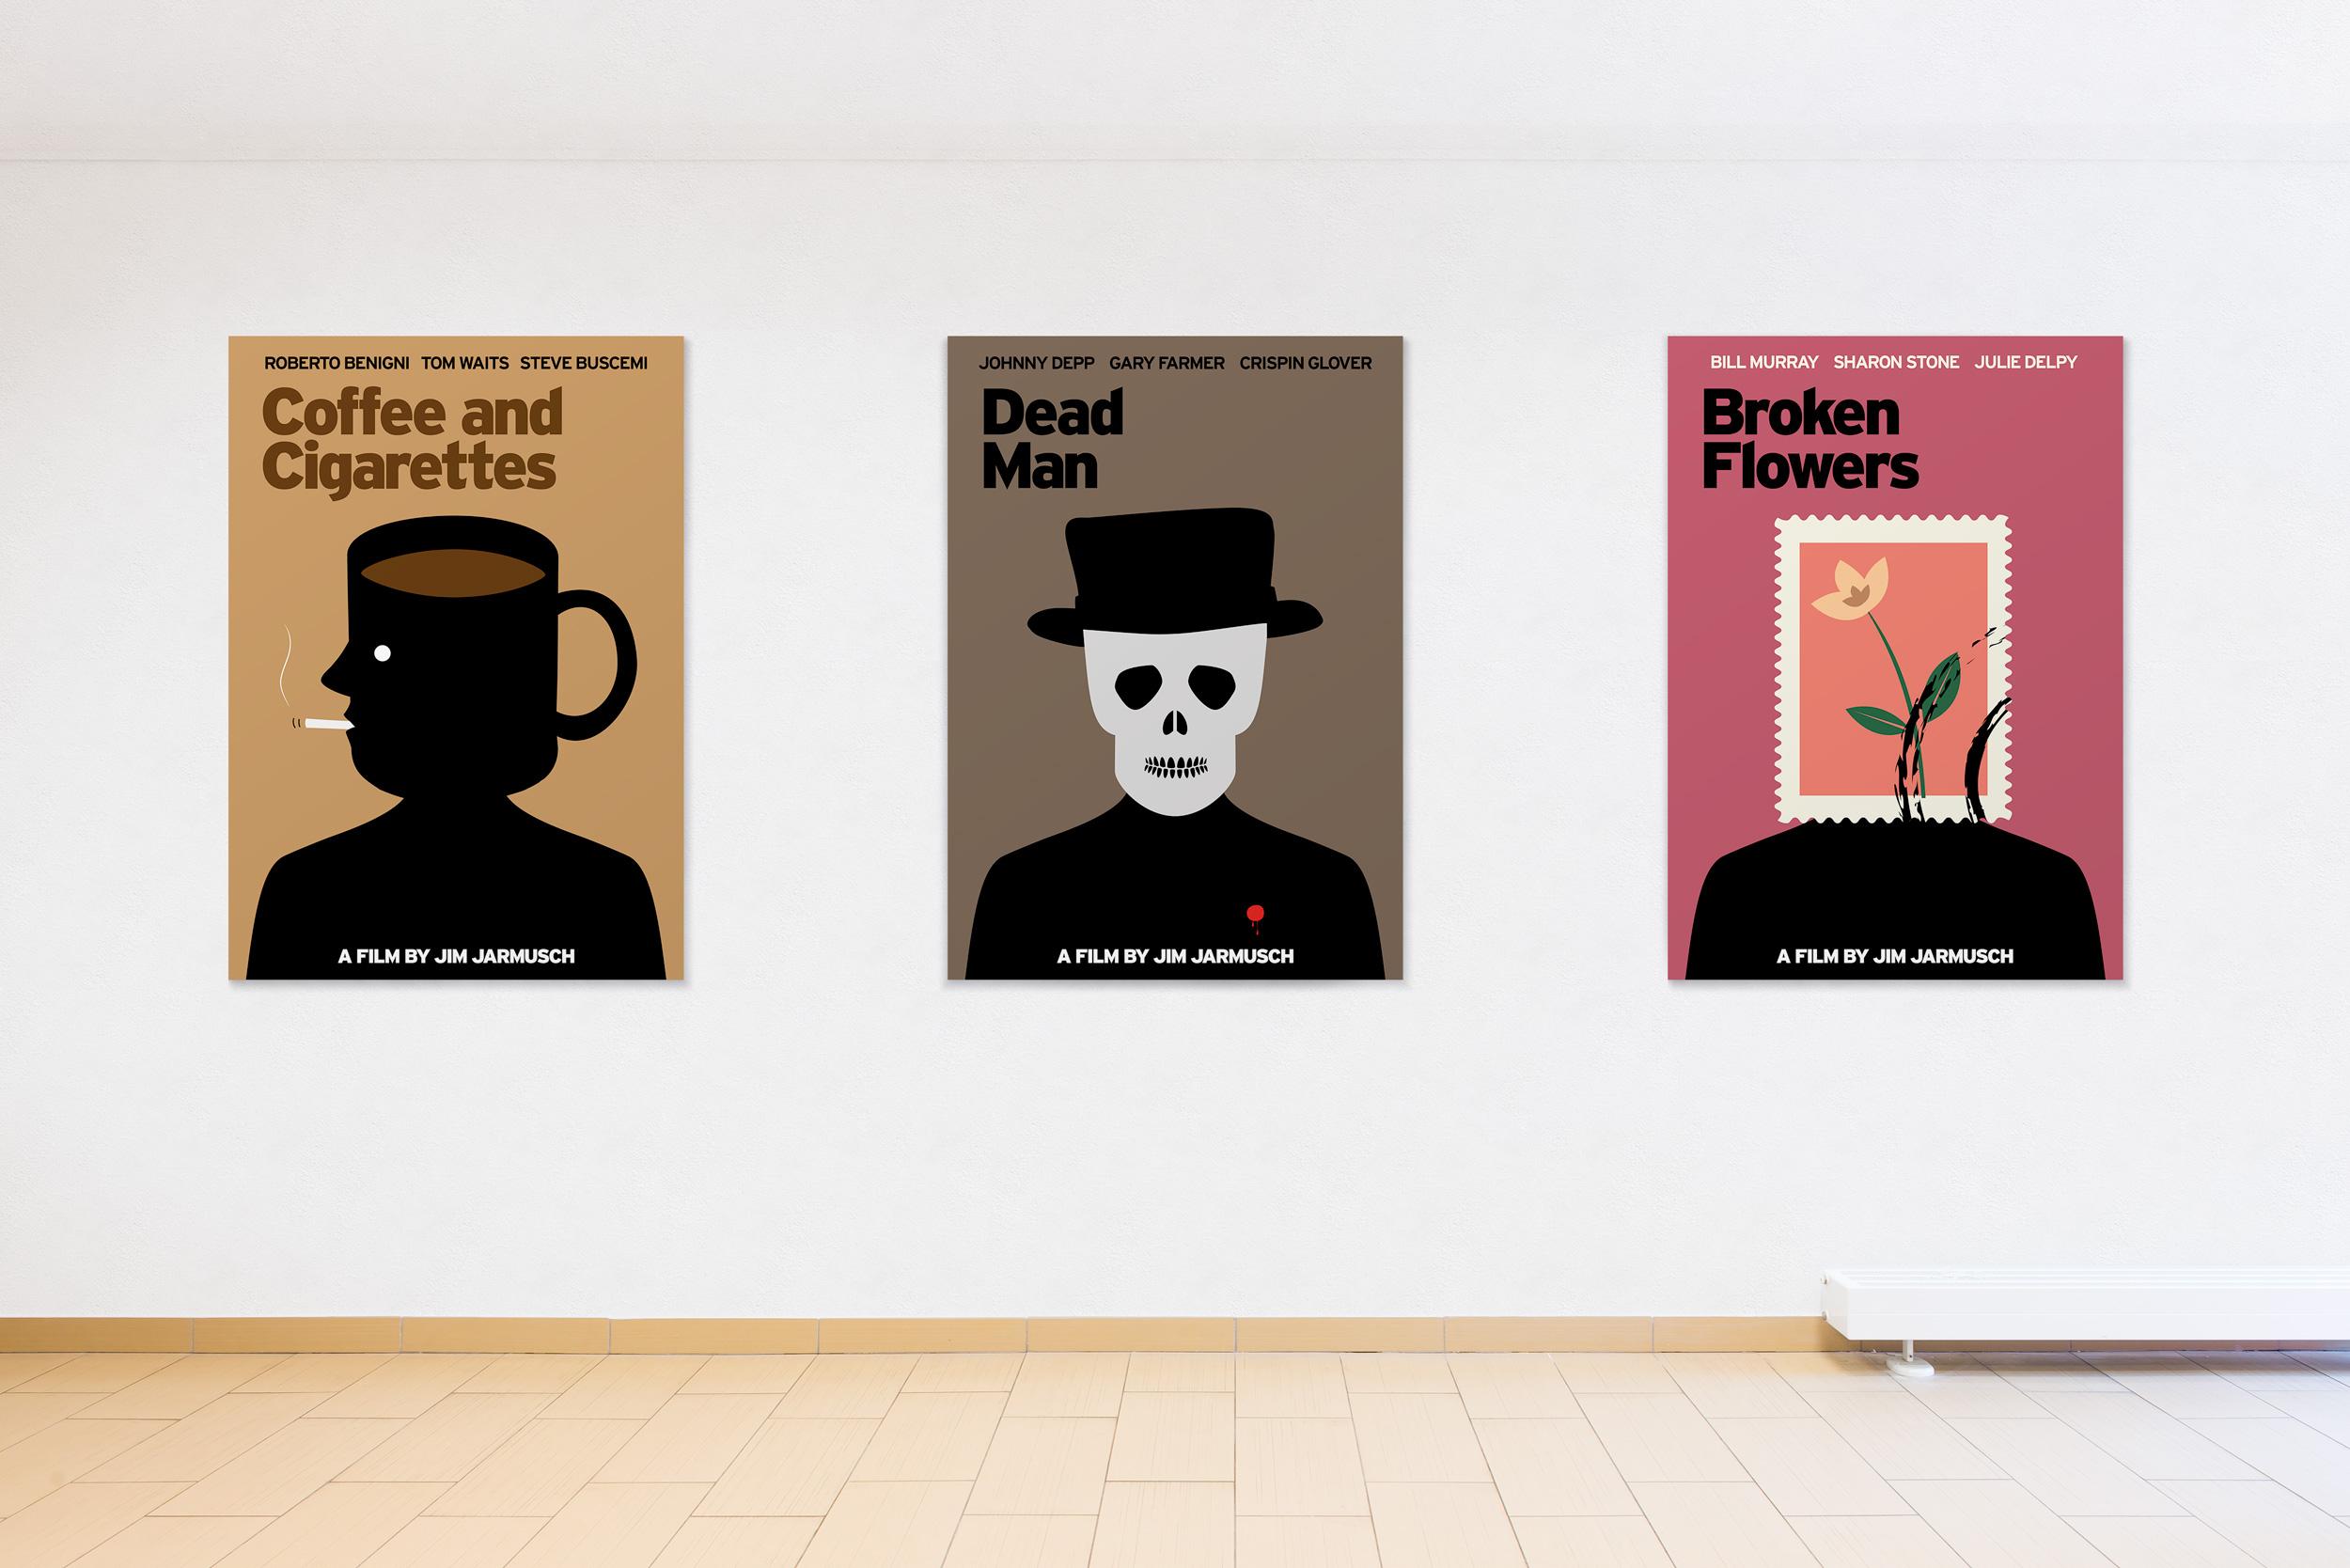 jimjarmusch-design-movie-posters-content-mix-1